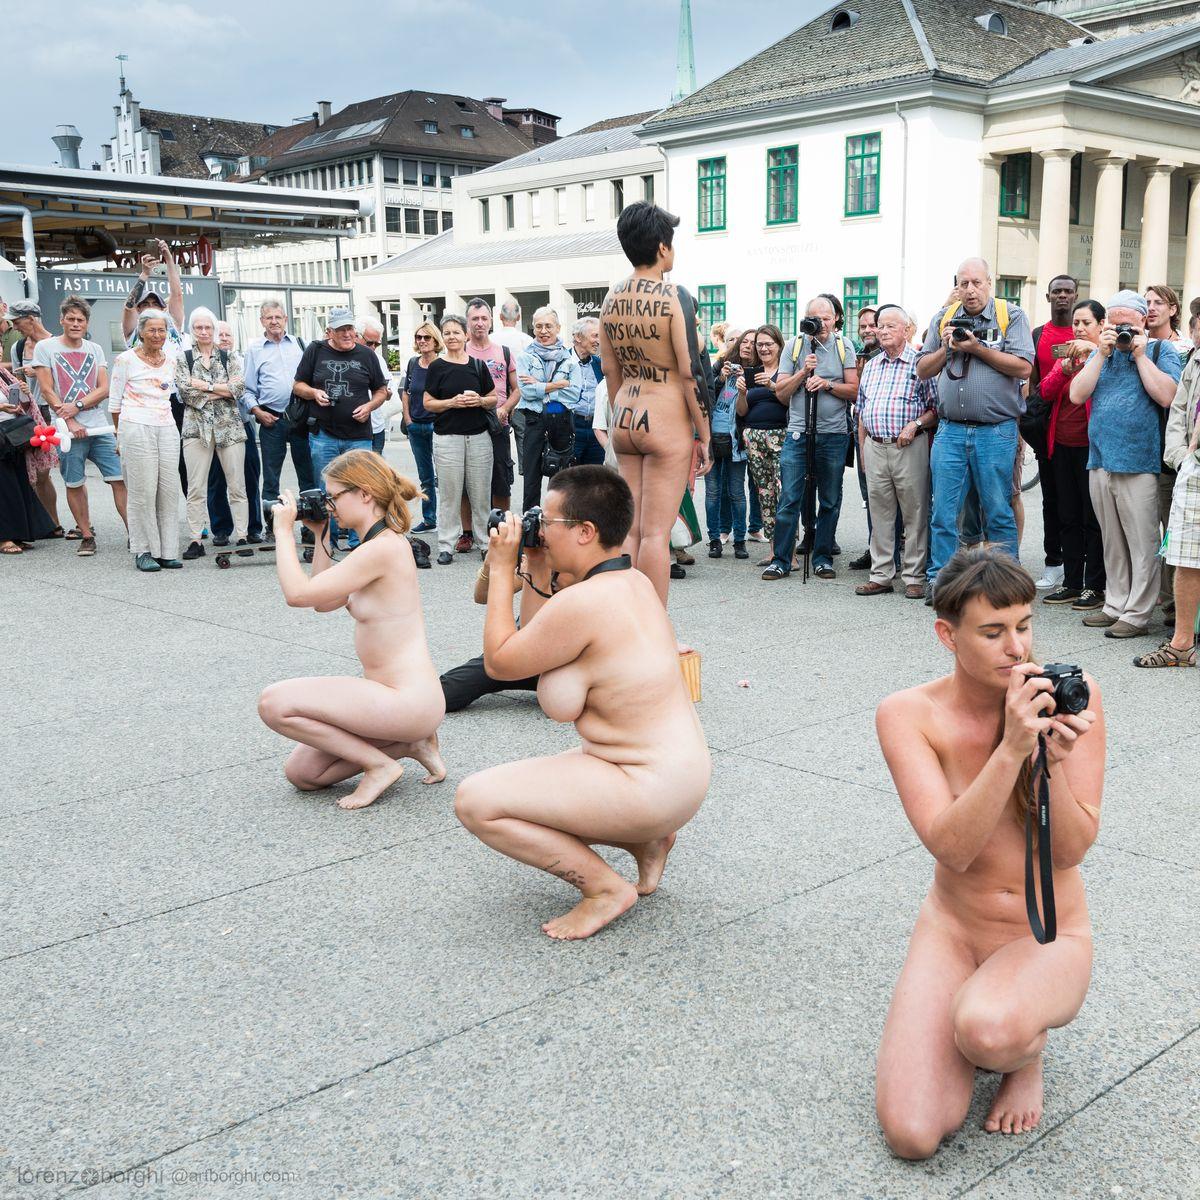 http://bodyandfreedom.com/wp-content/uploads/2018/09/artborghi_ritualtheater_in_zurich-6219-.jpg